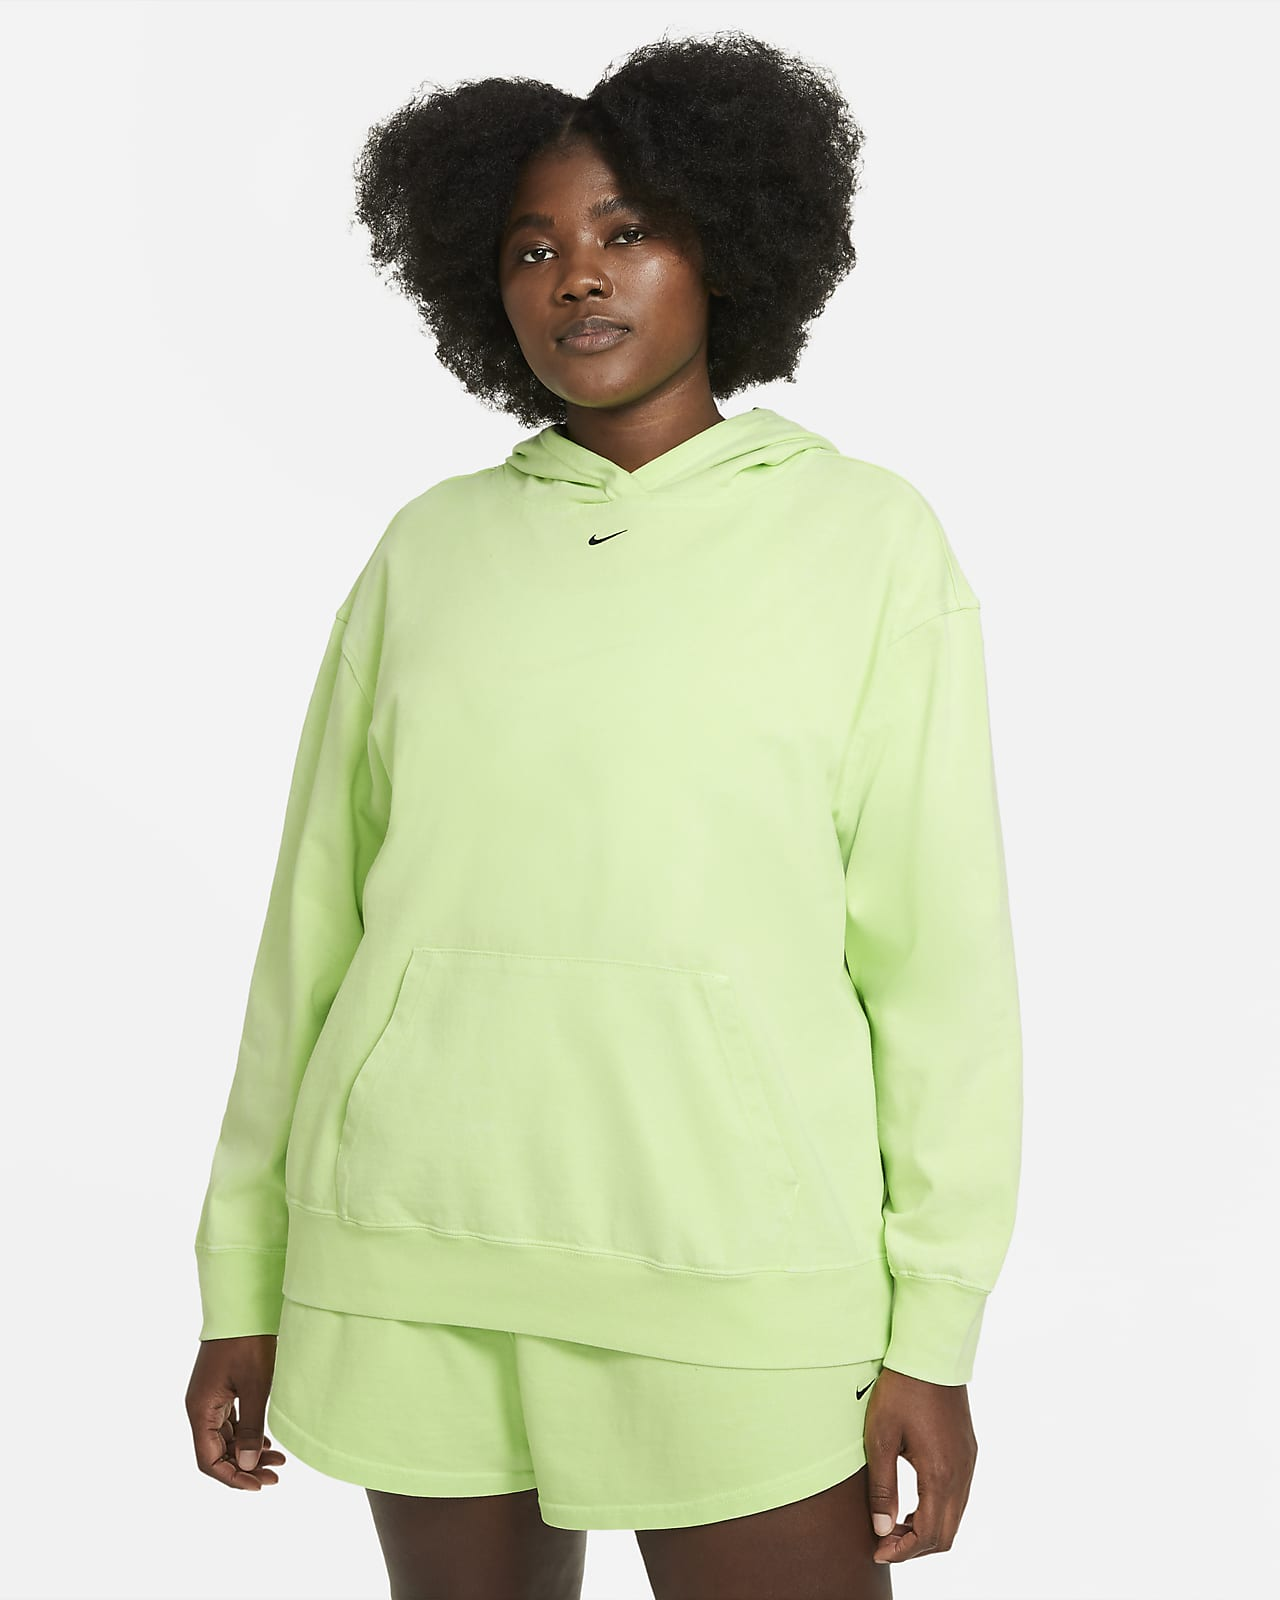 Sudadera con gorro lavada para mujer Nike Sportswear (talla grande)